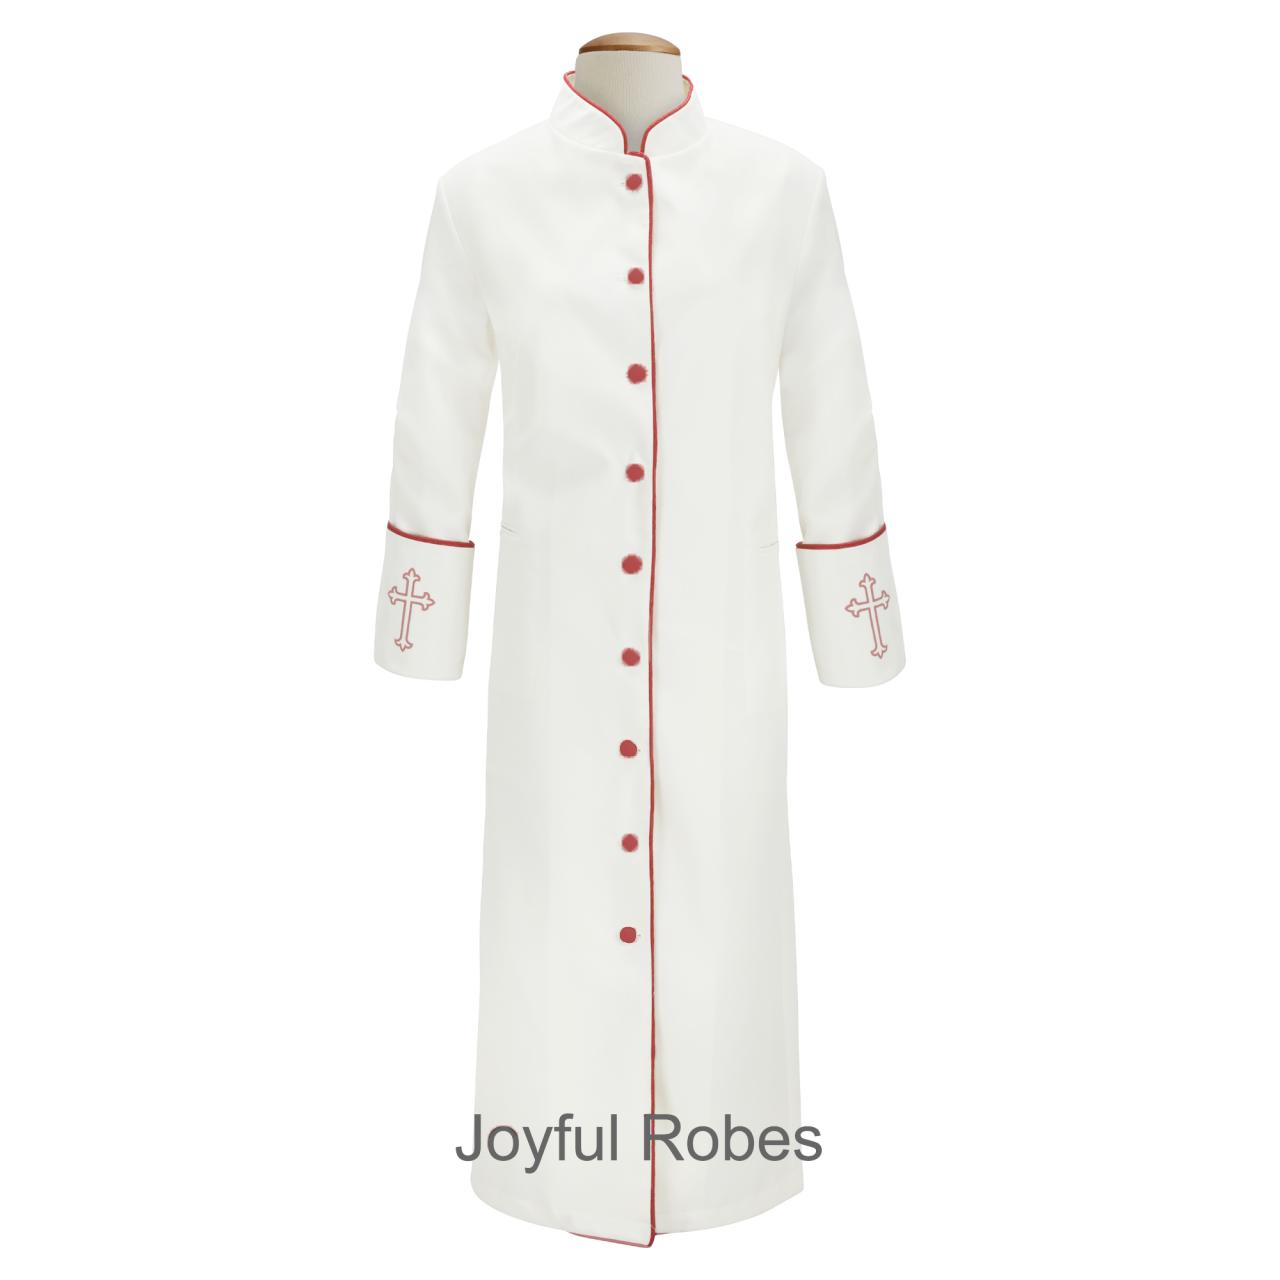 201 W. Women's Clergy/Pastor Robe - White/Red Design